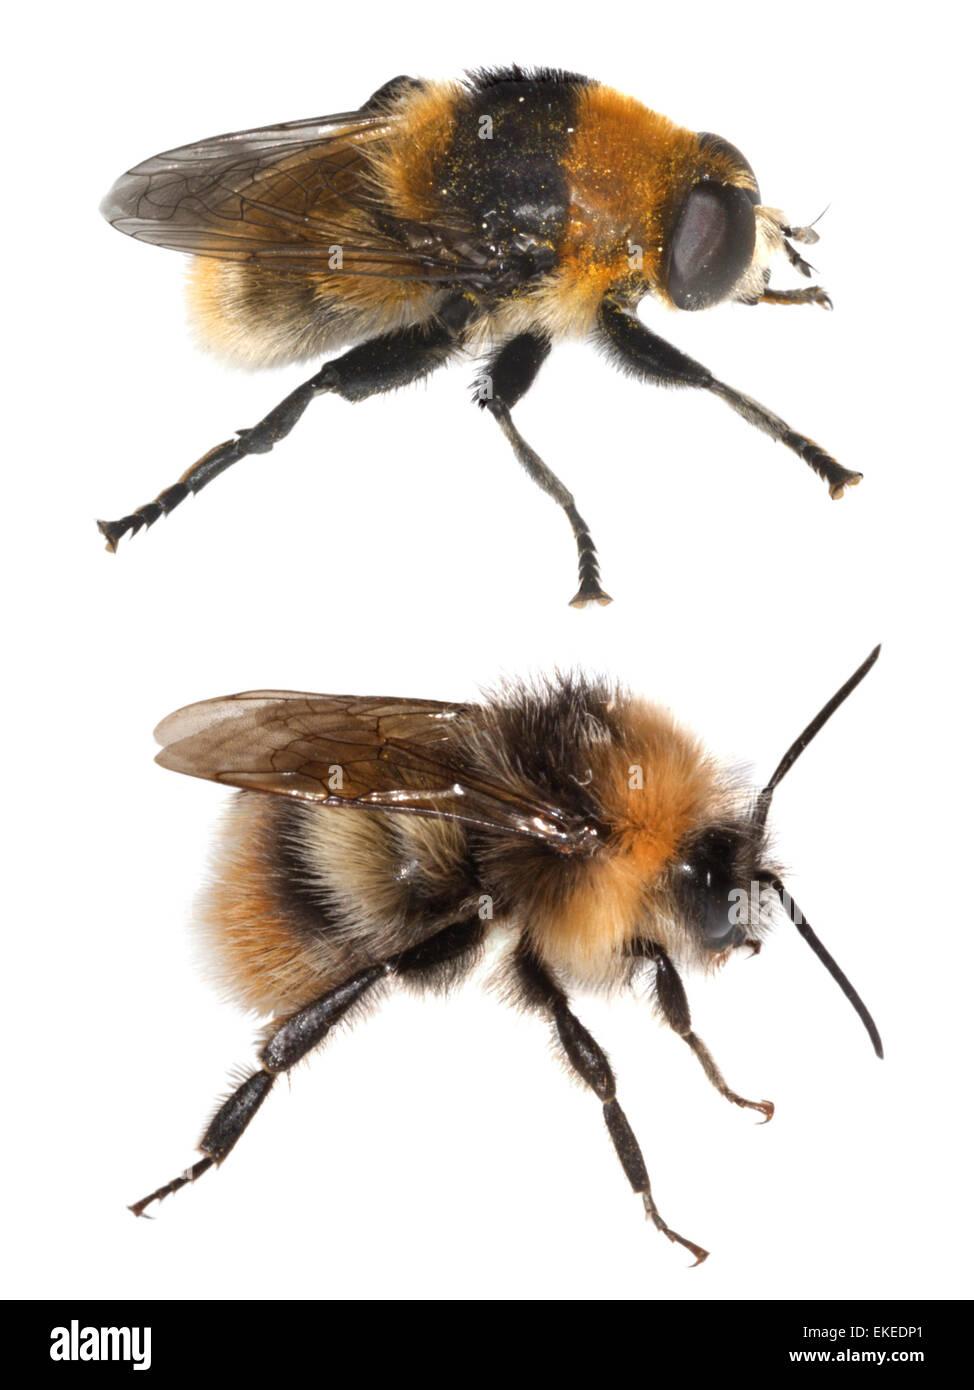 Bumblebee Bombus lucorum (bottom) and hoverfly mimic (top) Volucella bombylans - Stock Image